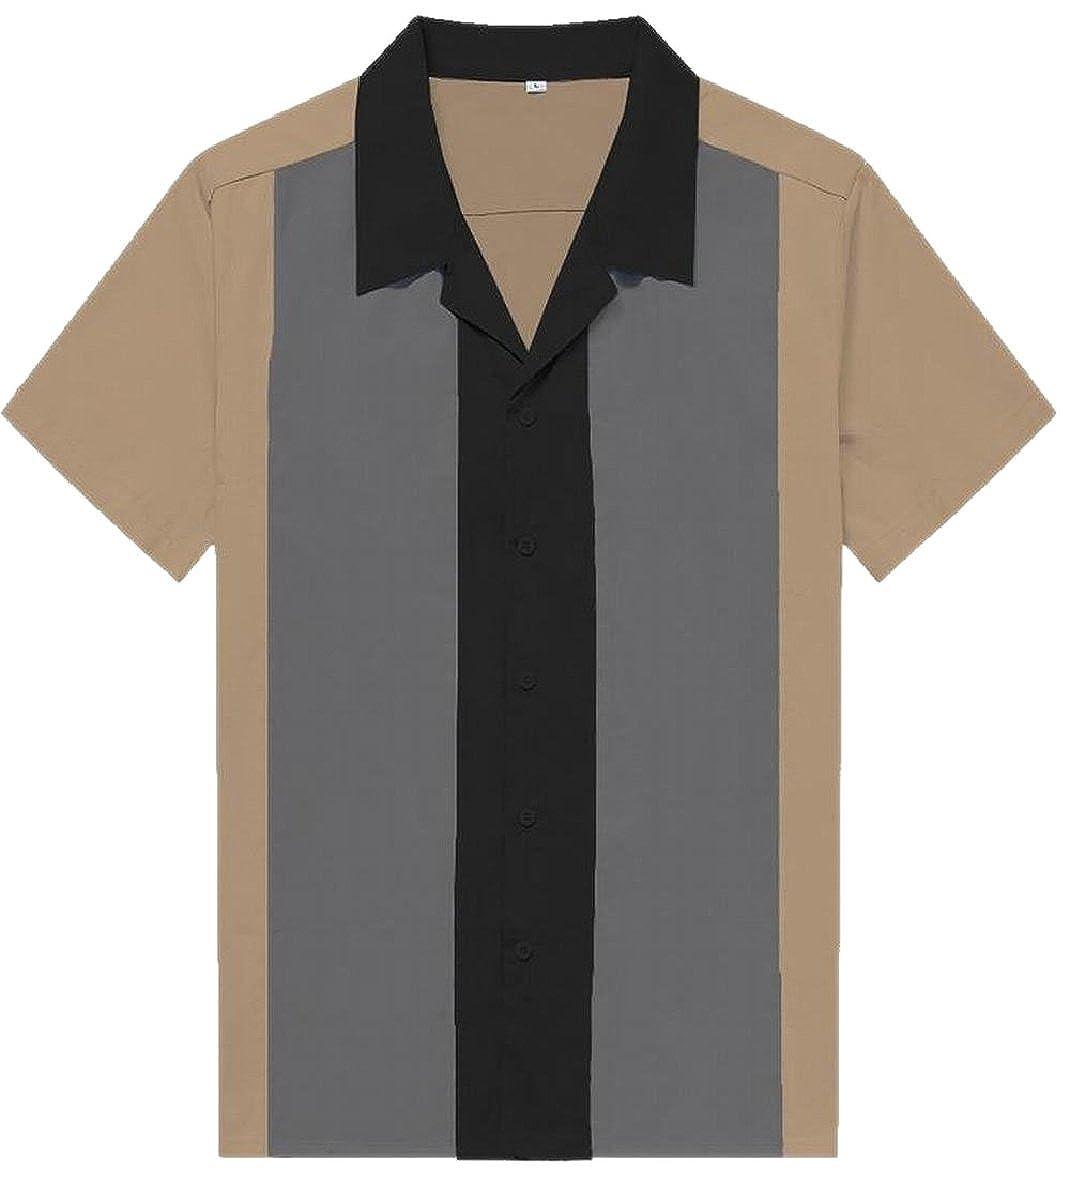 CBTLVSN Mens 50s Male Rockabilly Bowling Style Dress Shirt Brown XL